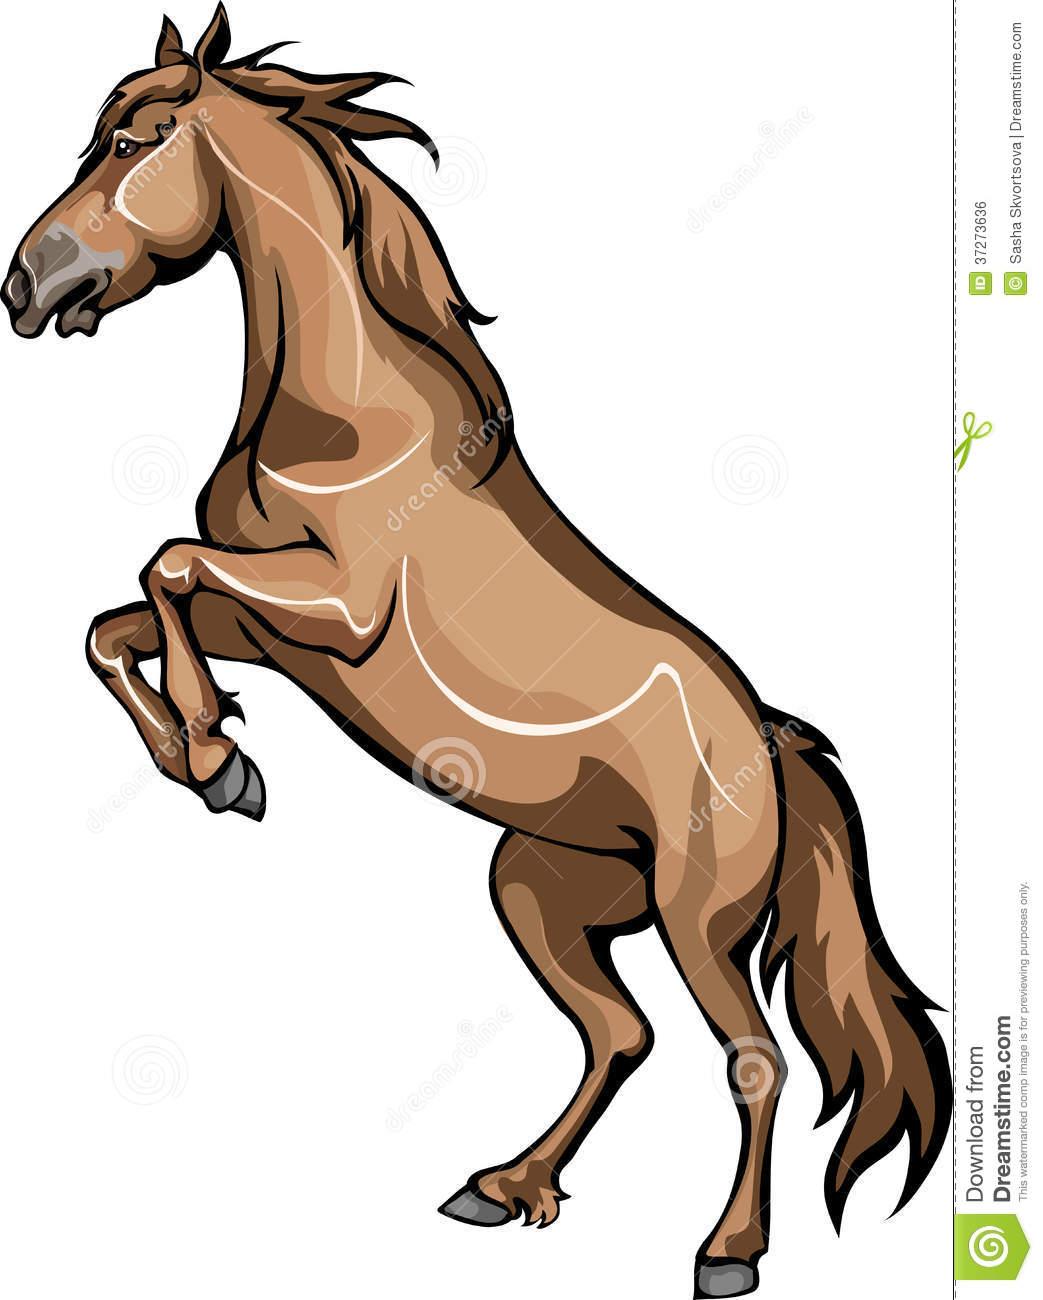 1043x1300 Stallion Clipart Hind Leg